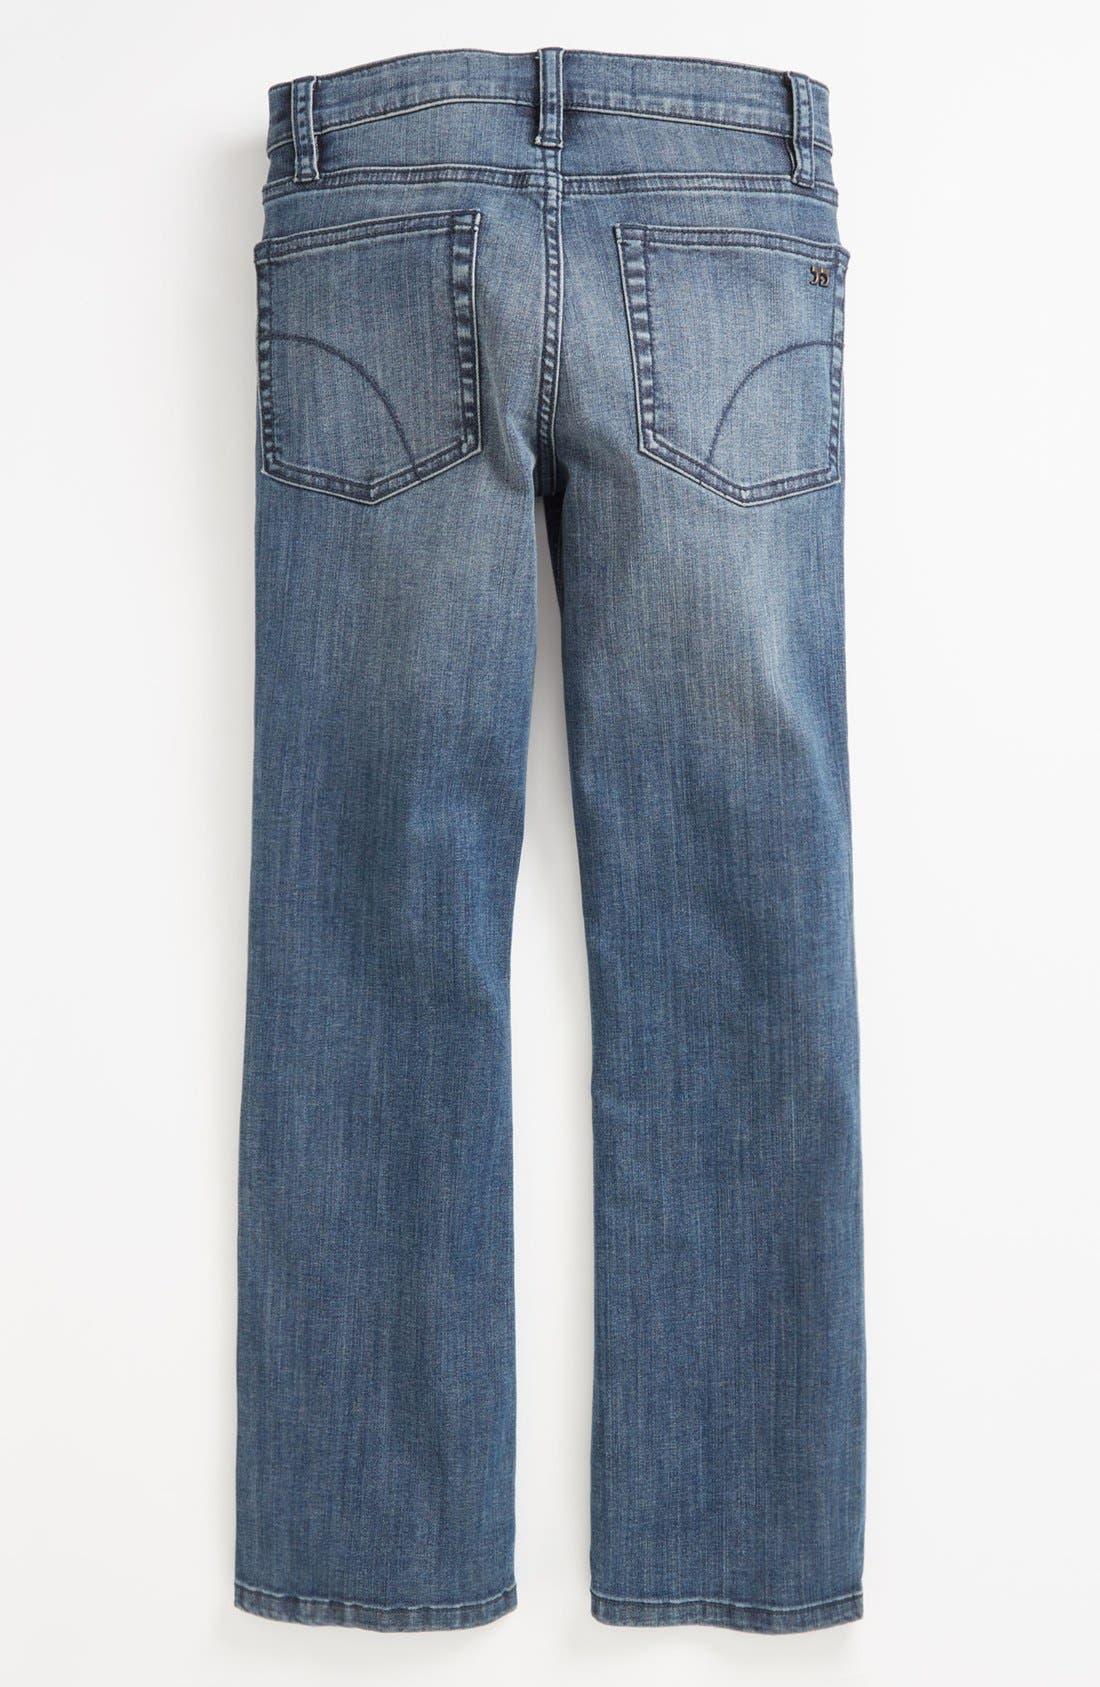 Alternate Image 1 Selected - Joe's 'Rebel' Straight Leg Jeans (Big Boys)